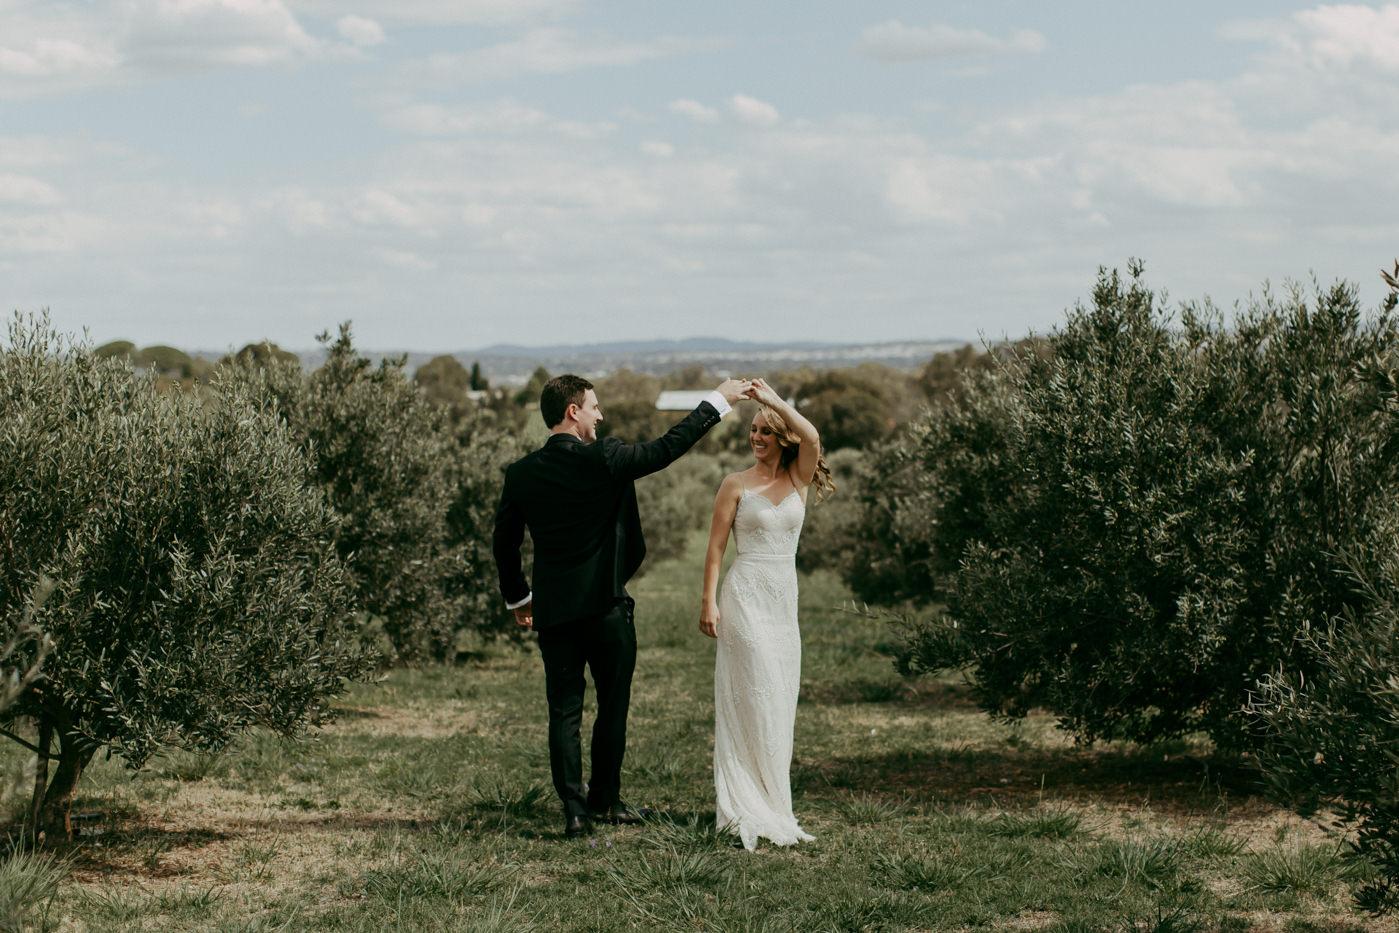 Anthony & Eliet - Wagga Wagga Wedding - Country NSW - Samantha Heather Photography-73.jpg